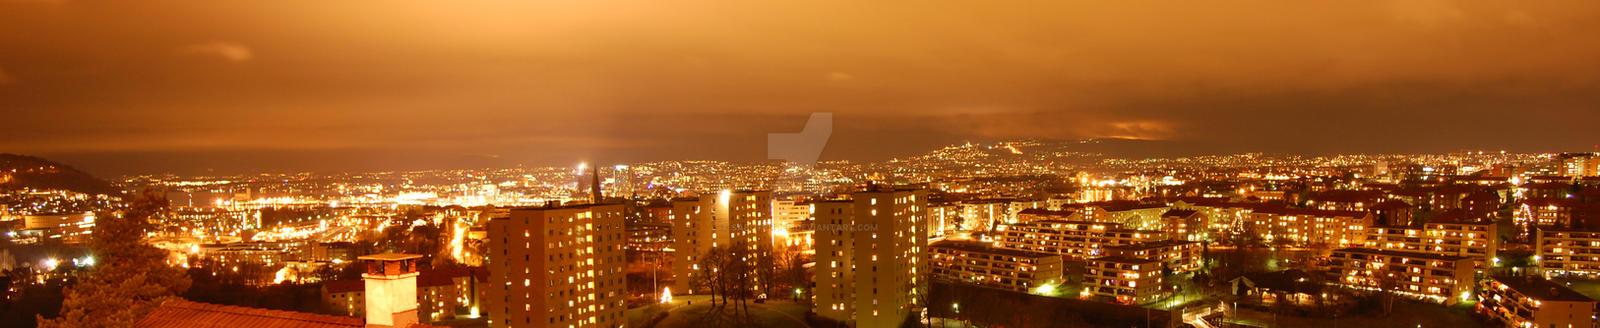 Oslo Panorama at night